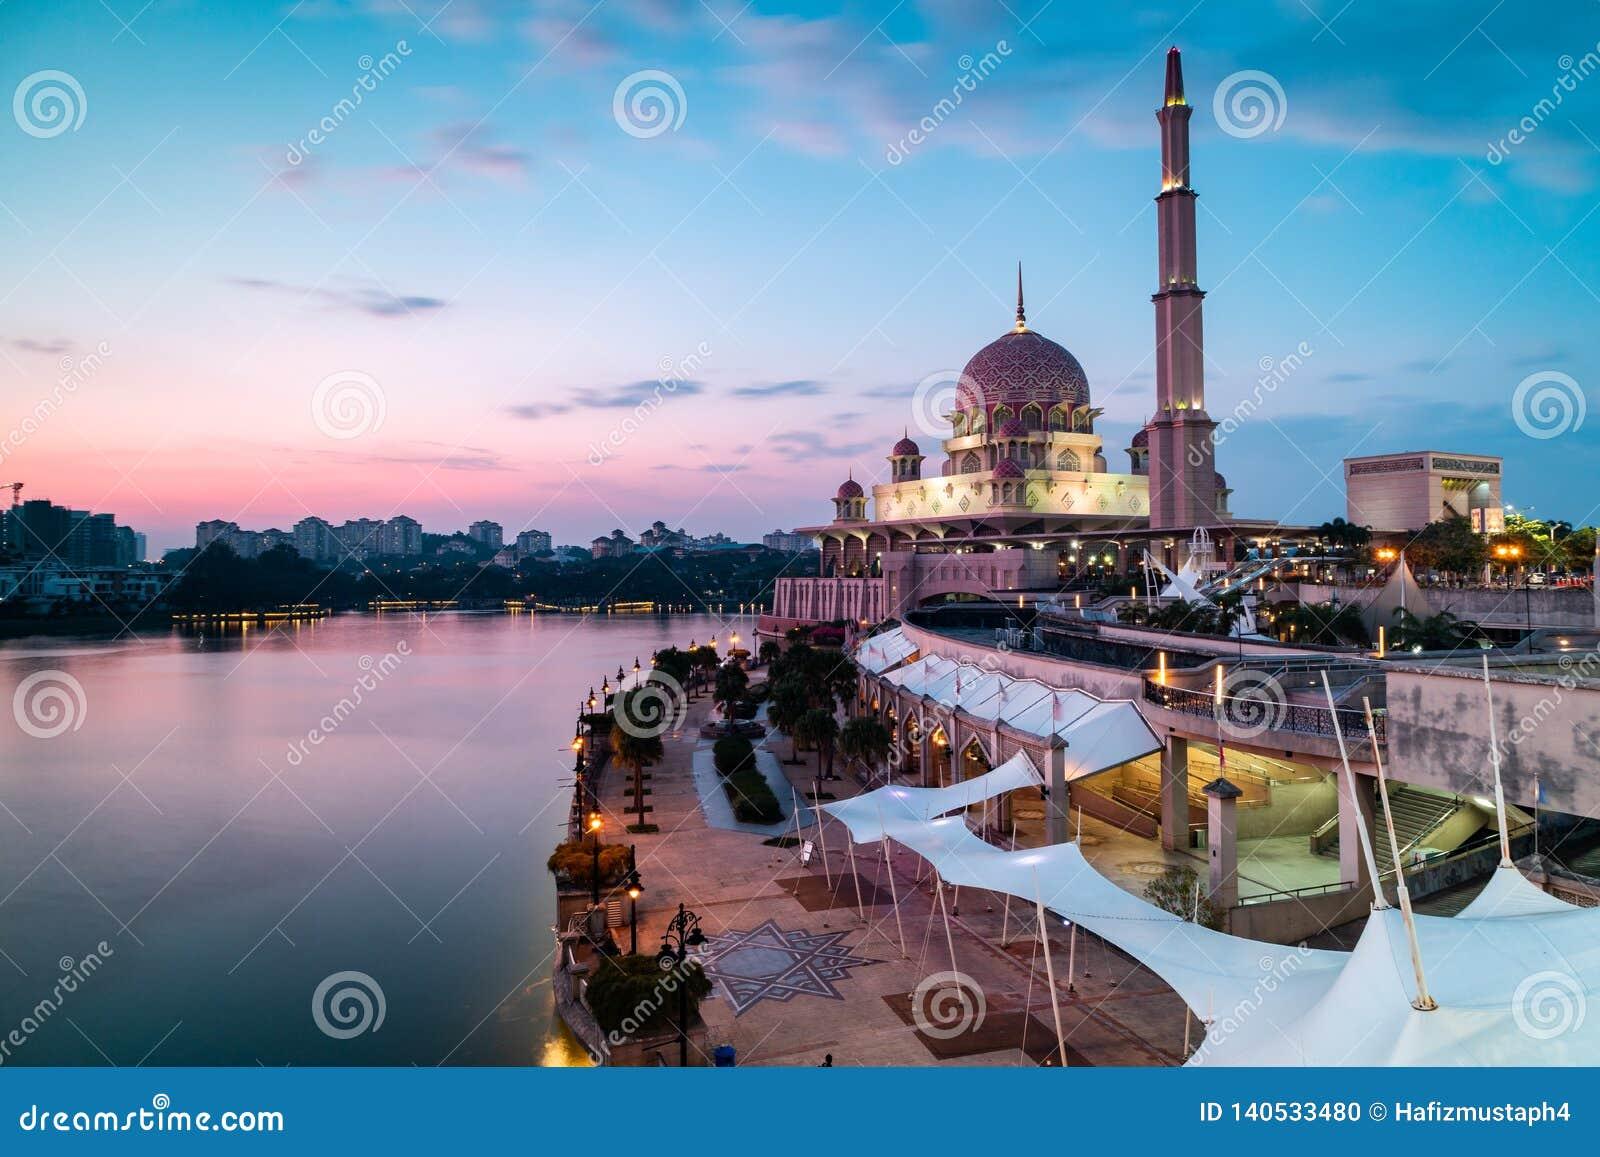 View of Putra Mosque just before blue hour. Long Exposure Landscape Orientation